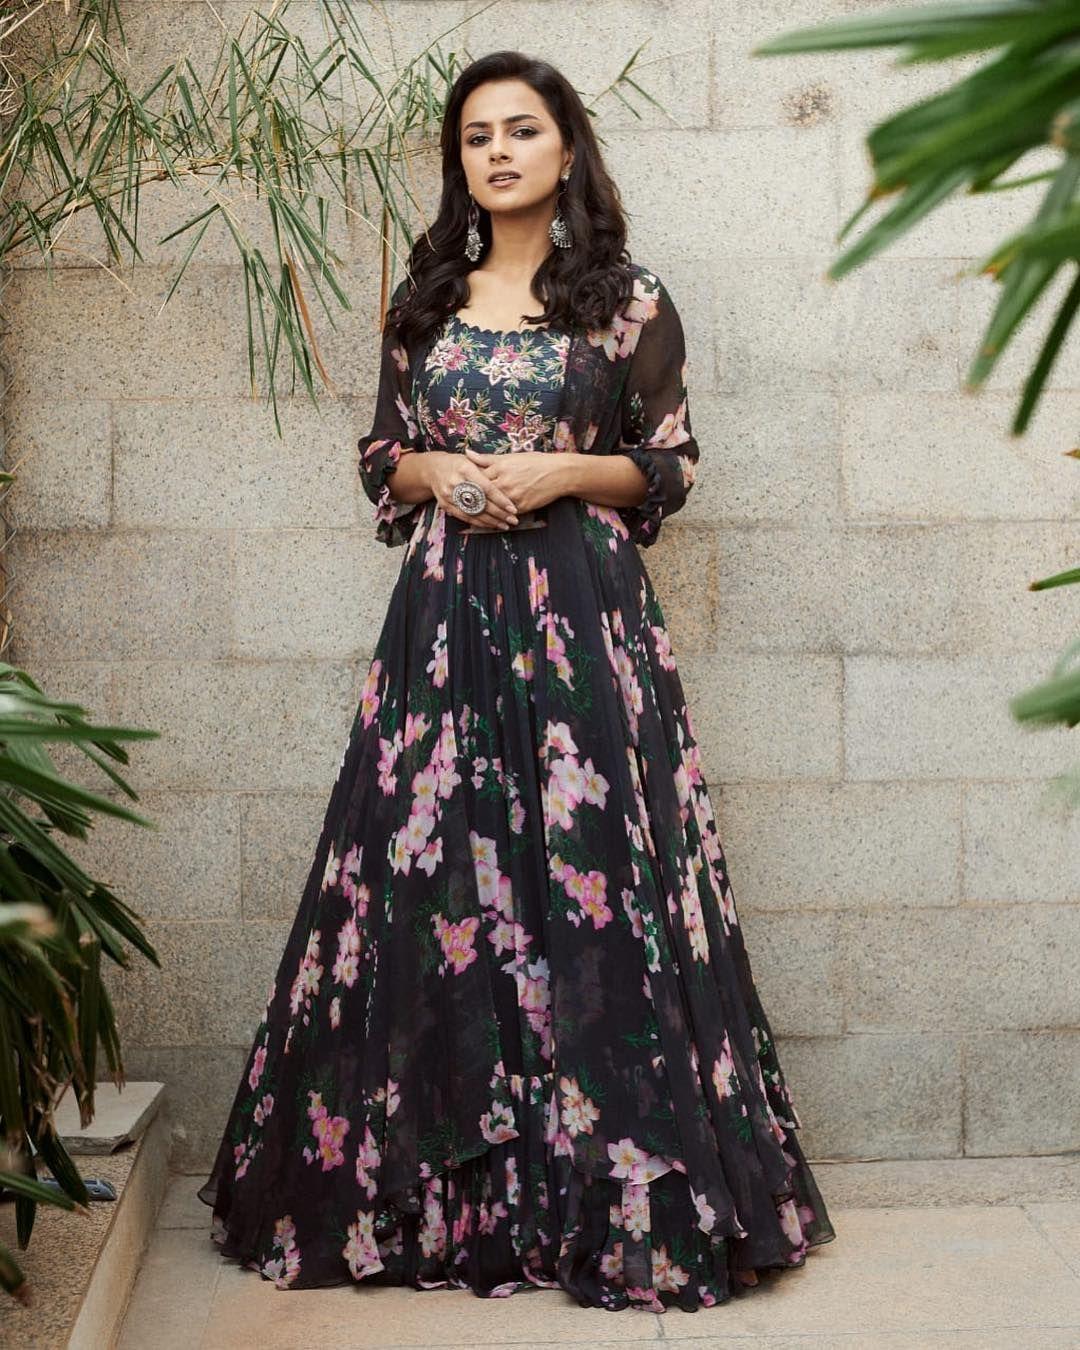 23b04a4922 Actress @shraddhasrinath in Mrunalini Rao latest collection . Calantha  collection by Mrunalini Rao. Stunning